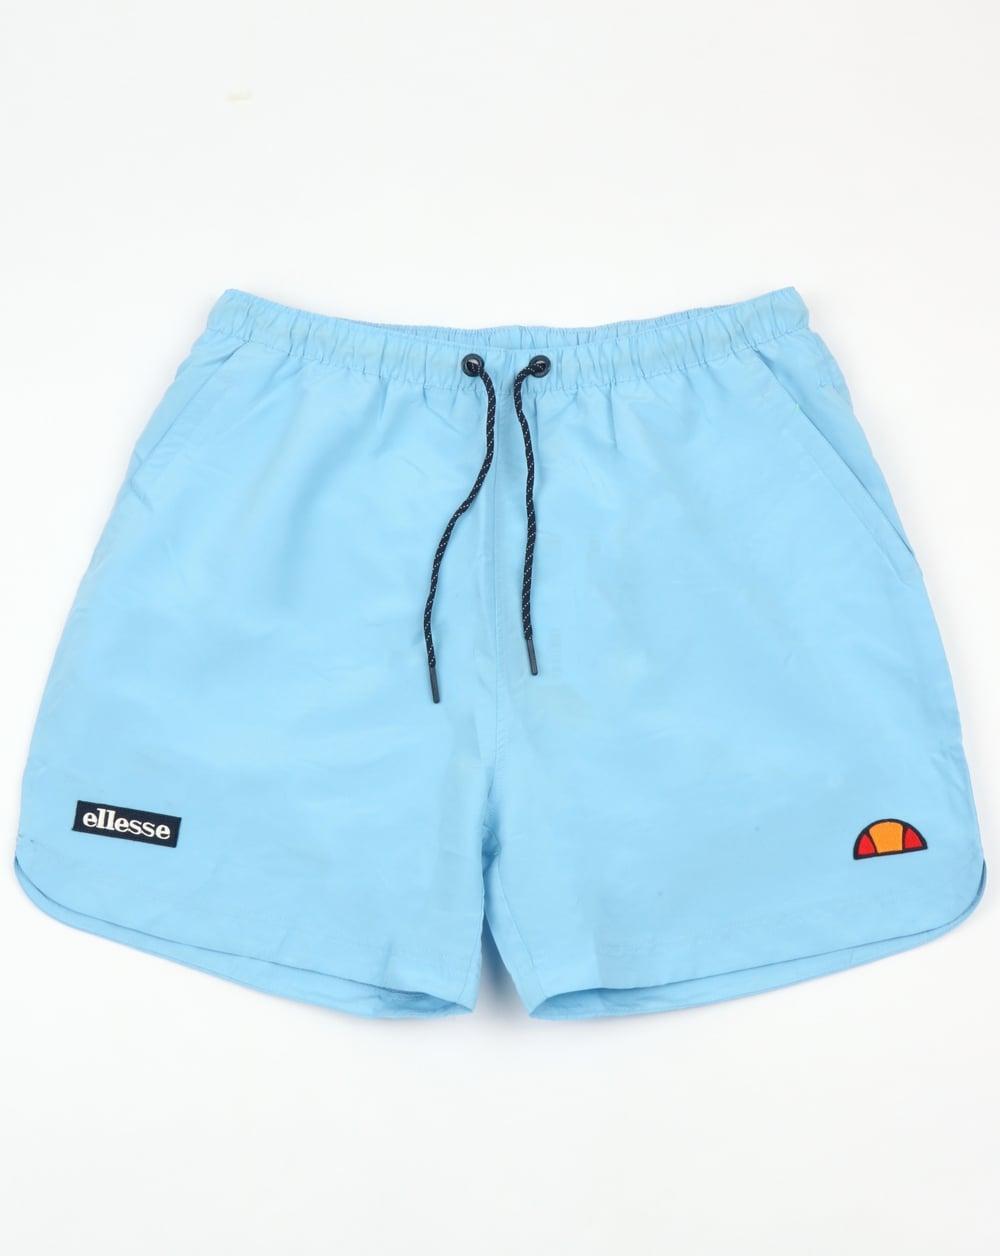 2d37394067 Ellesse Verdo Swim Shorts Placid Blue,beach,swimmers,pool,mens